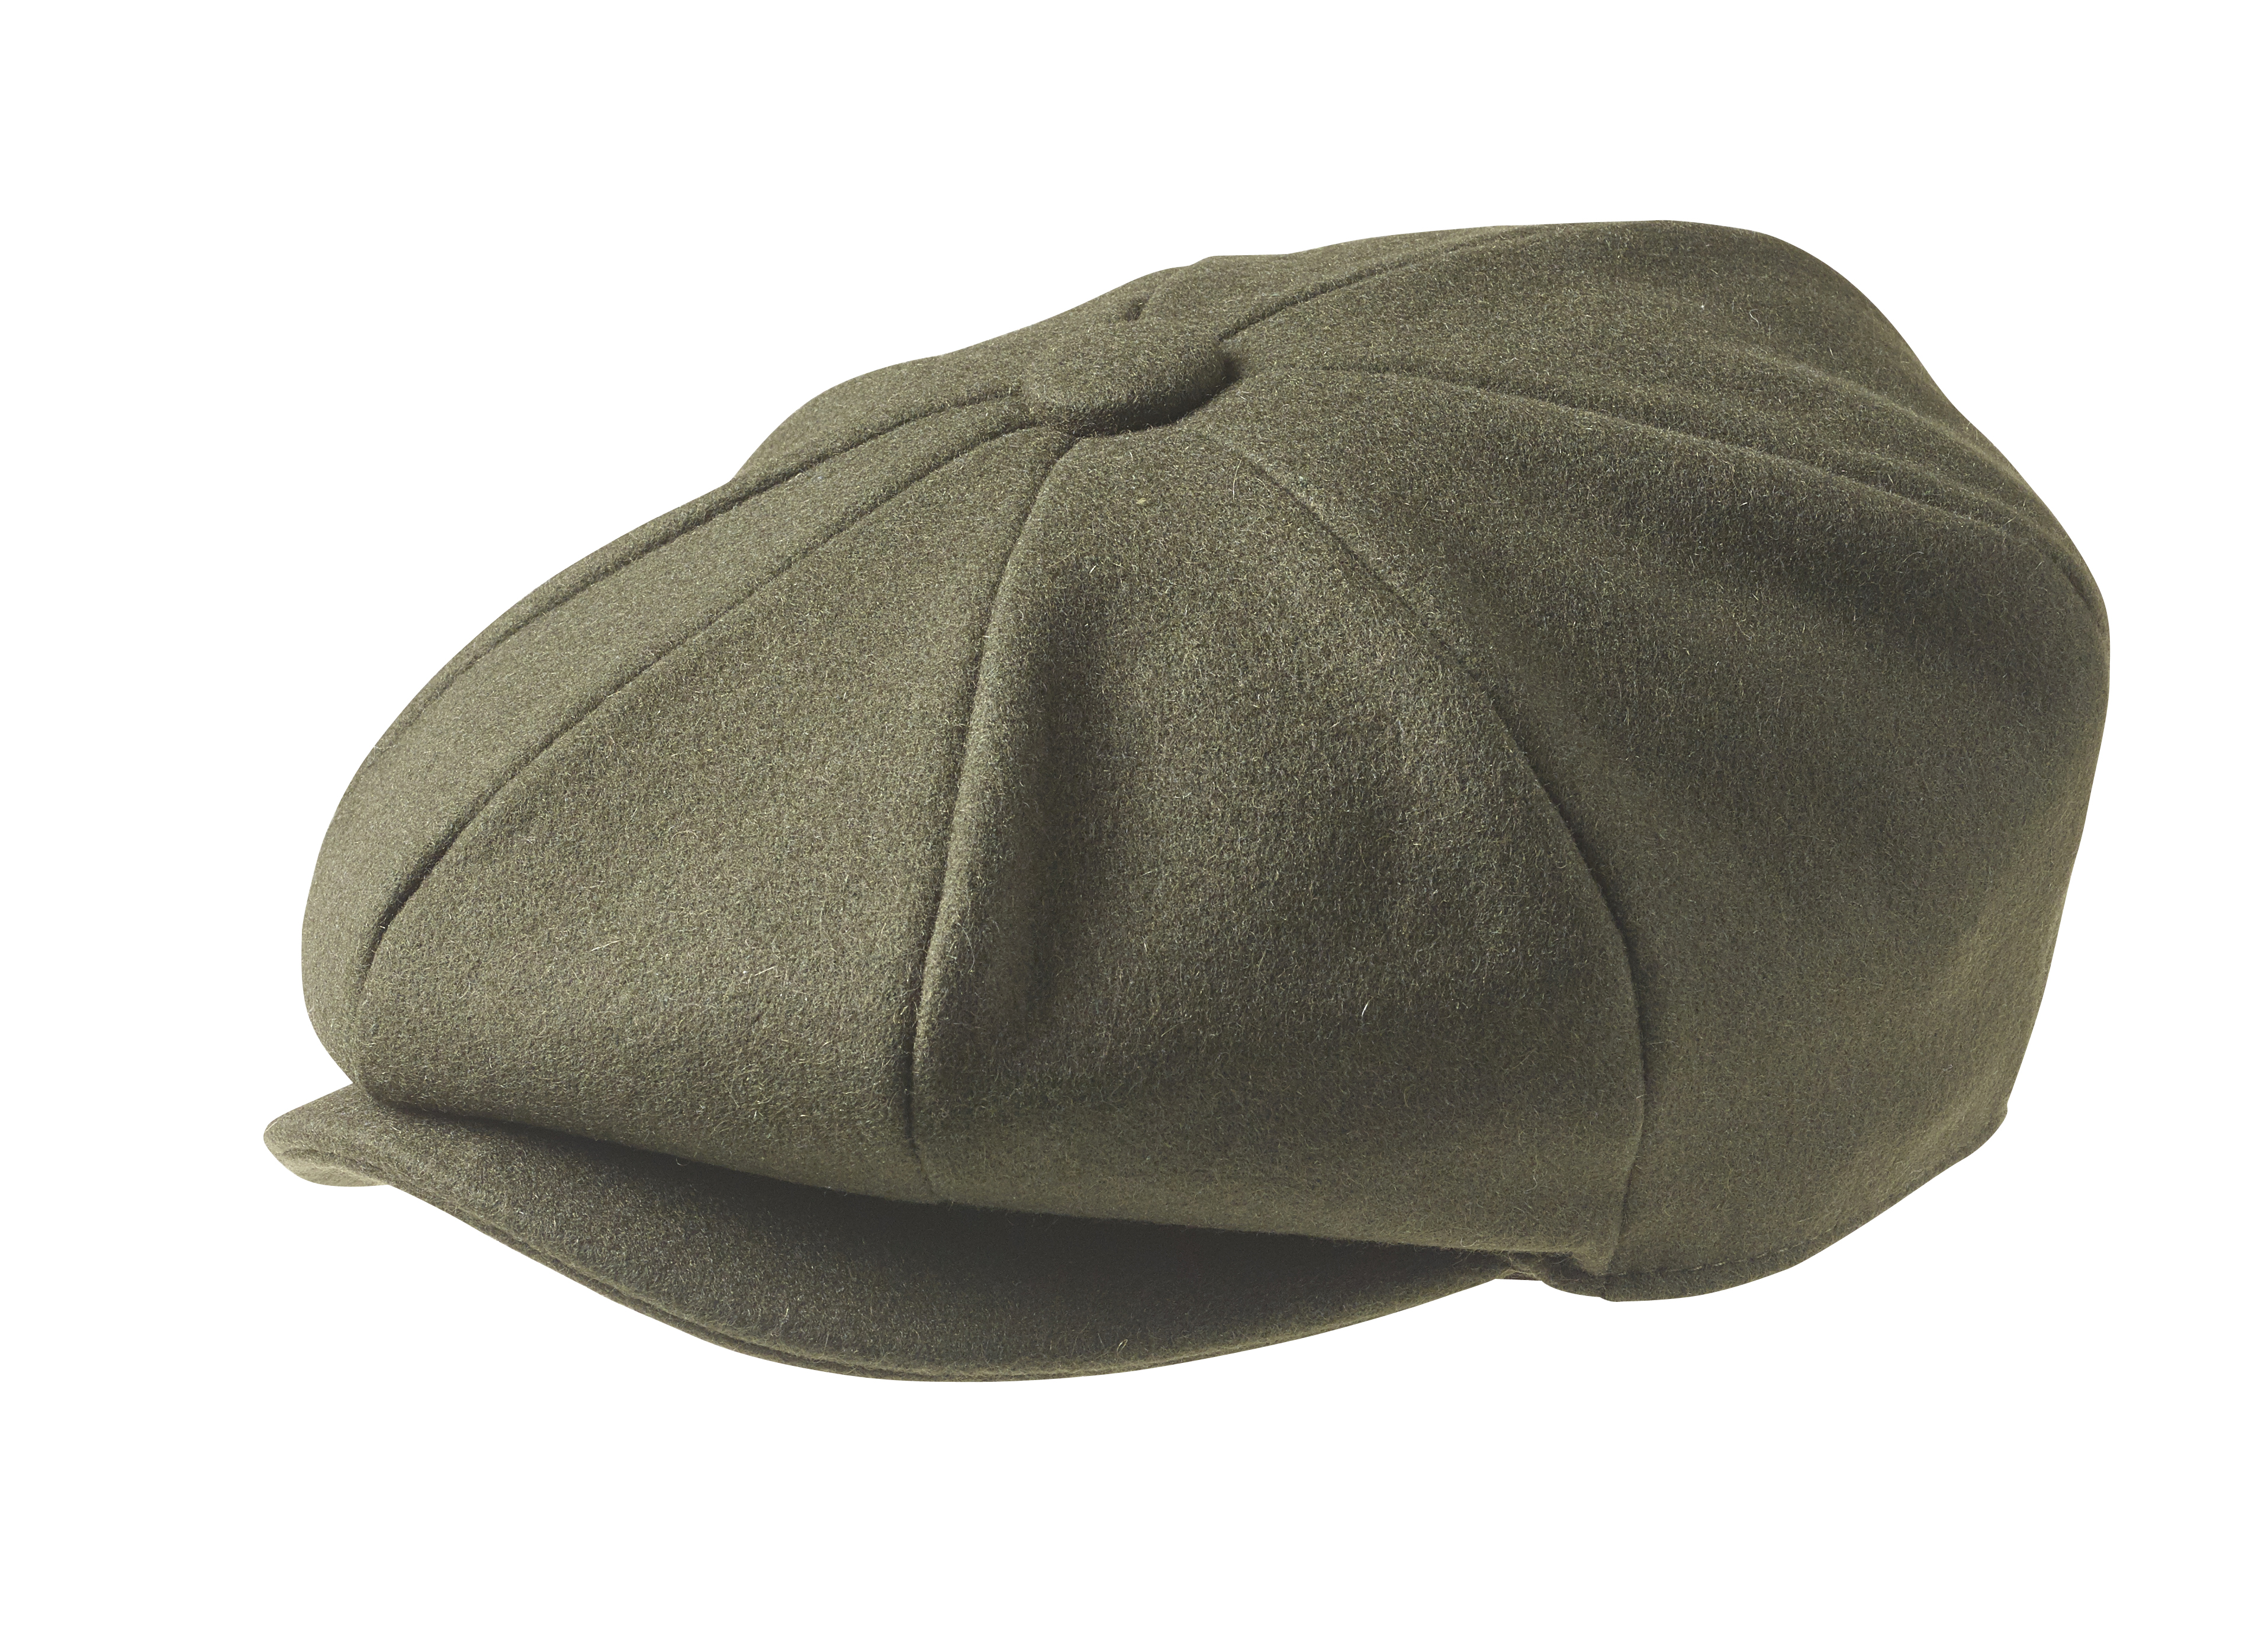 Peaky Blinders - 100% Melton Wool - Moss Green Newsboy Cap 44b1b0109f4